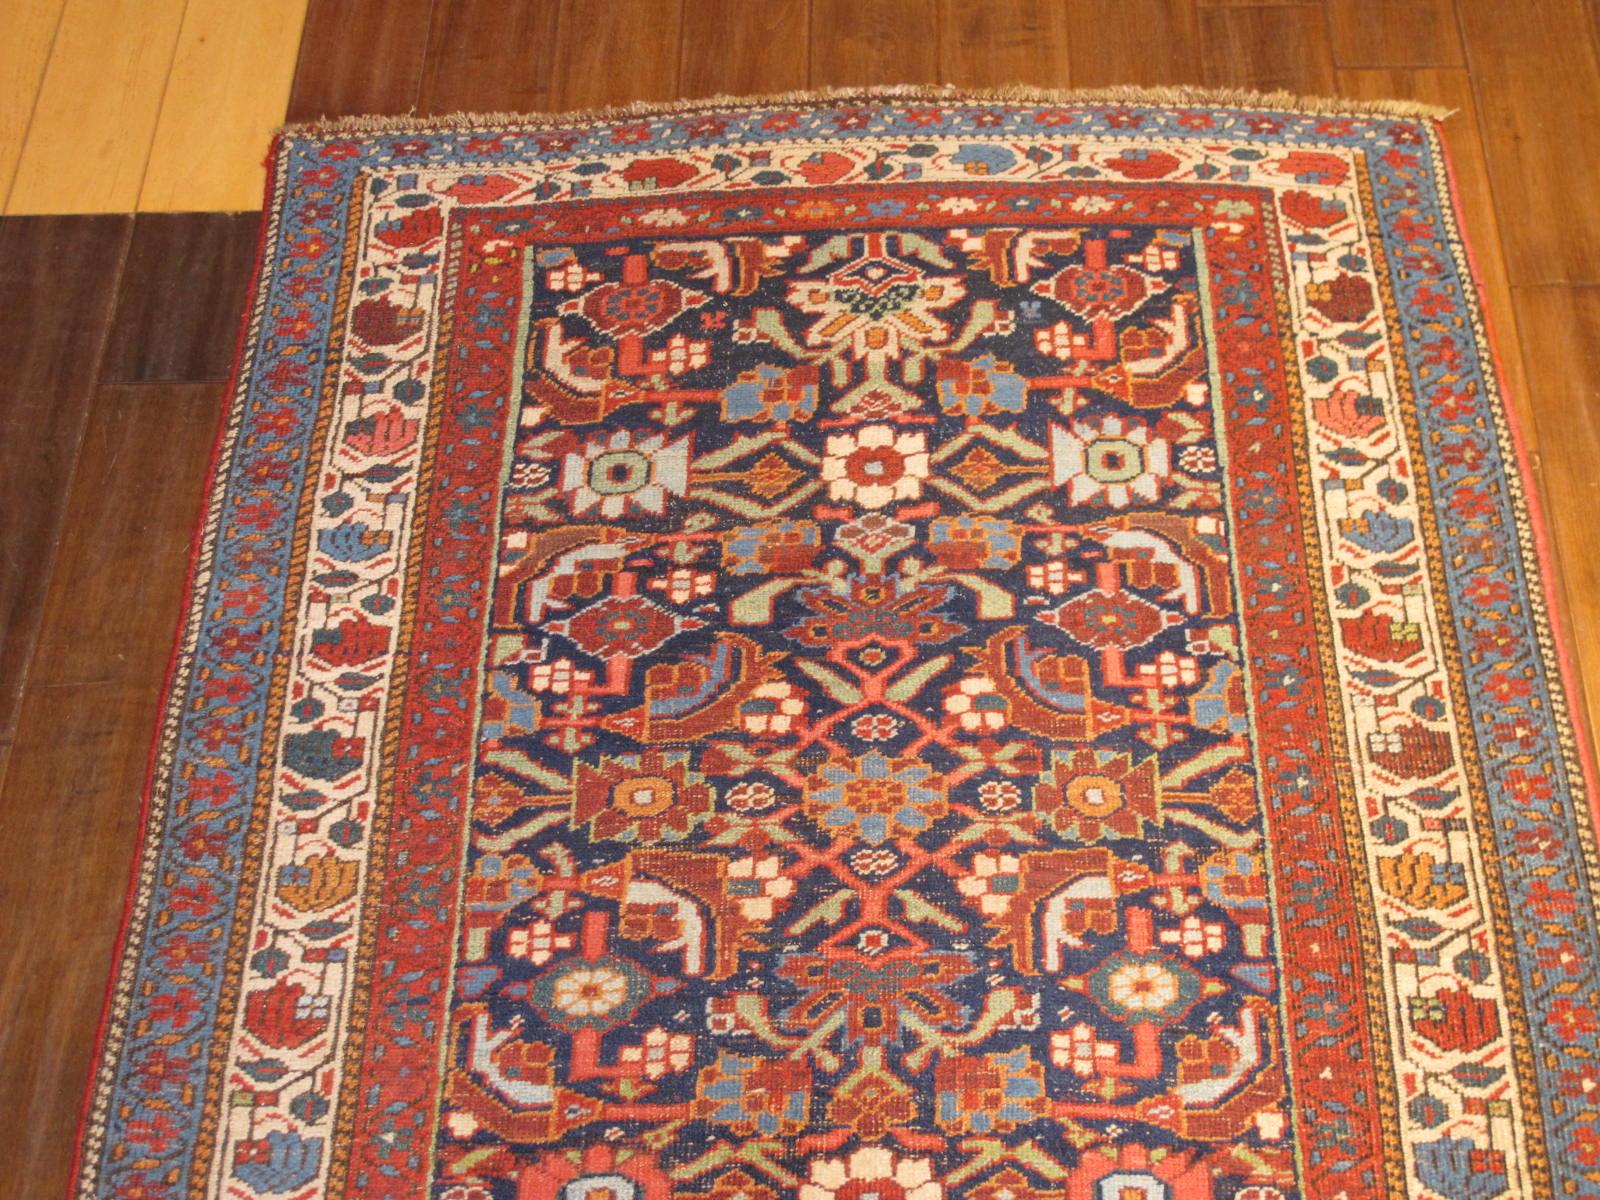 23182 antique persian bidjar runner 3,11 x 18,2 (2)